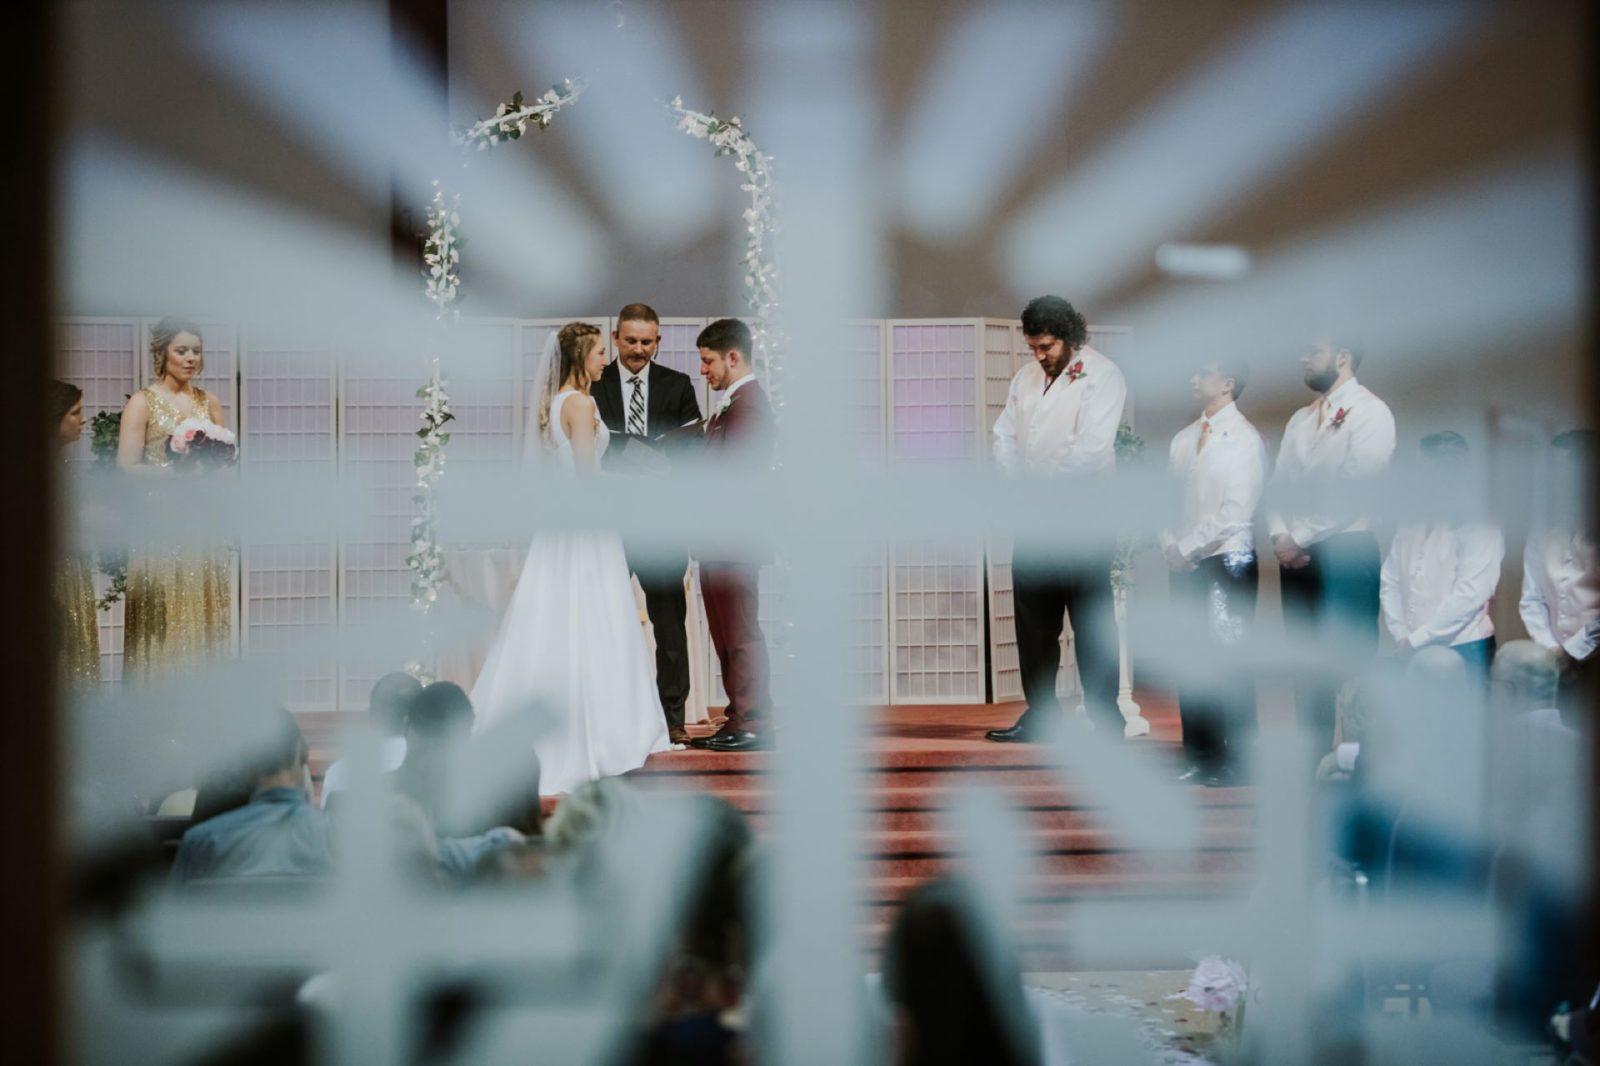 East-Central-Indiana-Wedding_029-1600x1066.jpg